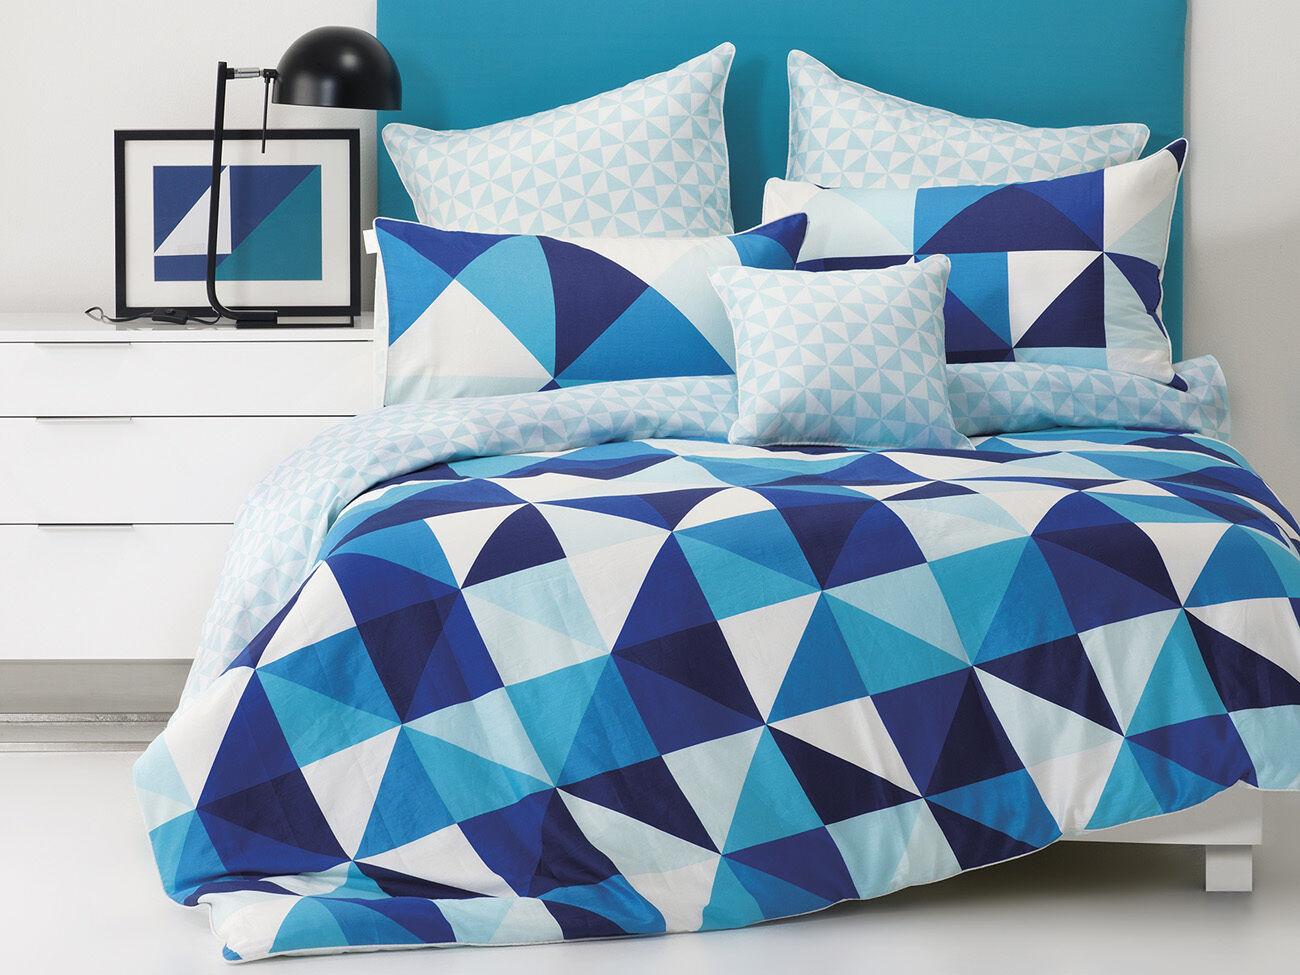 Cruze Duvet   Doona Quilt Cover Set by white   Triangle Design   Queen